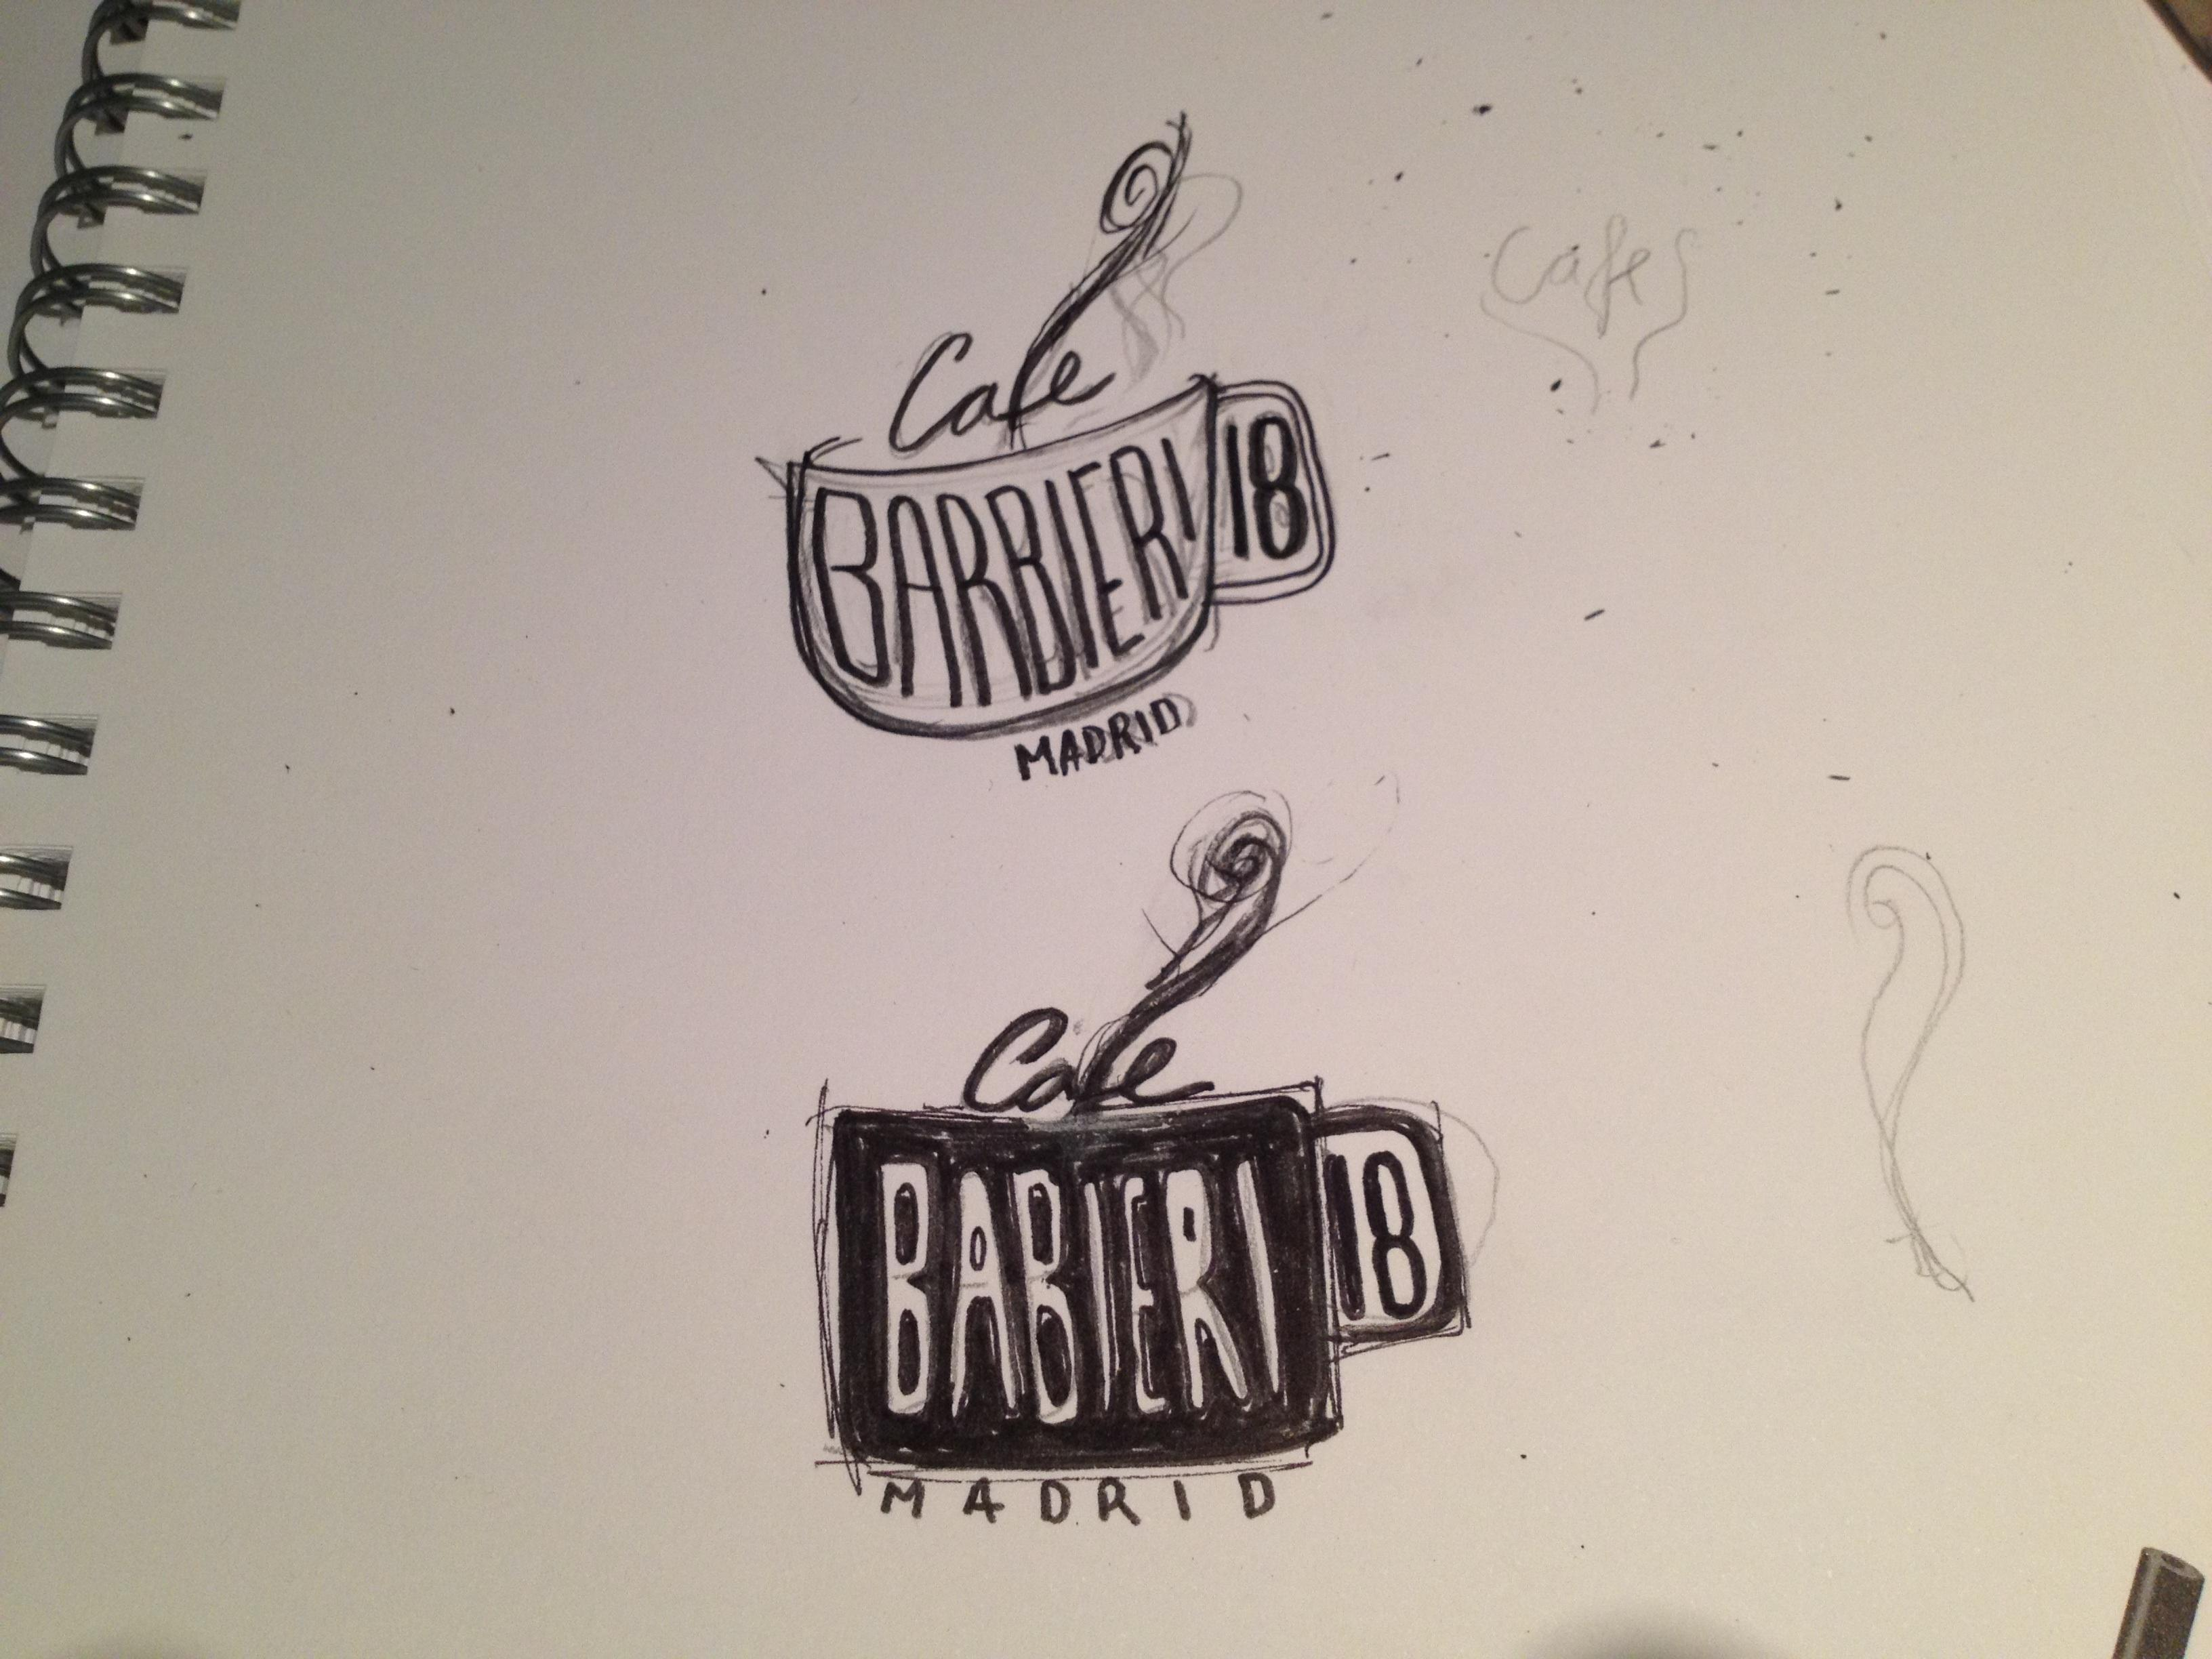 BARBIERI 18 - image 6 - student project